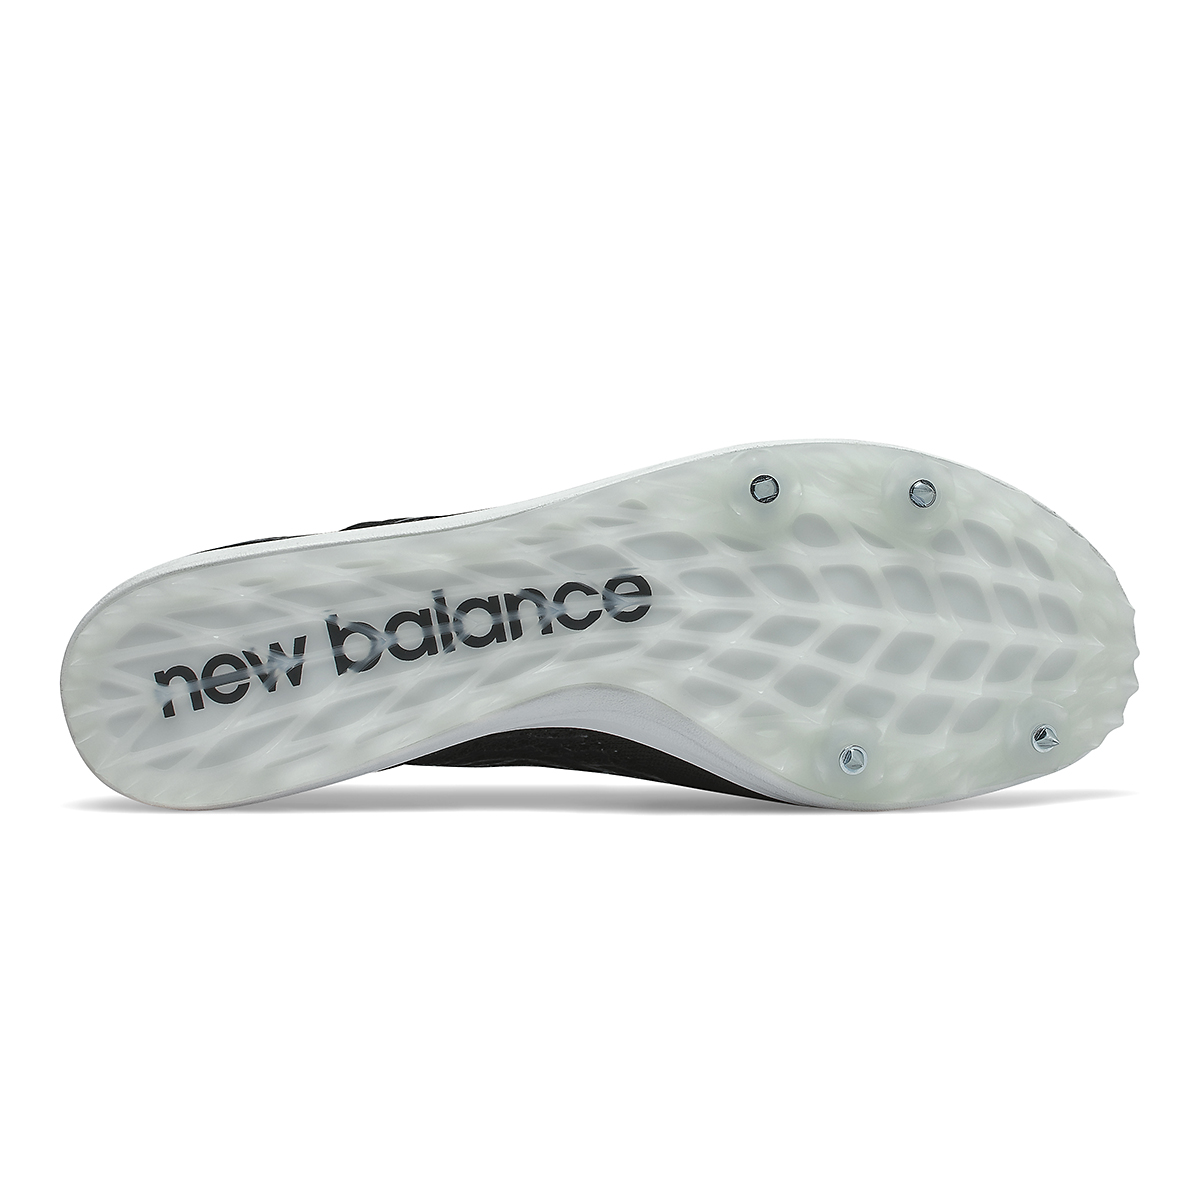 Women's New Balance LD5Kv8 Track Spikes - Color: Black/White - Size: 6 - Width: Regular, Black/White, large, image 4